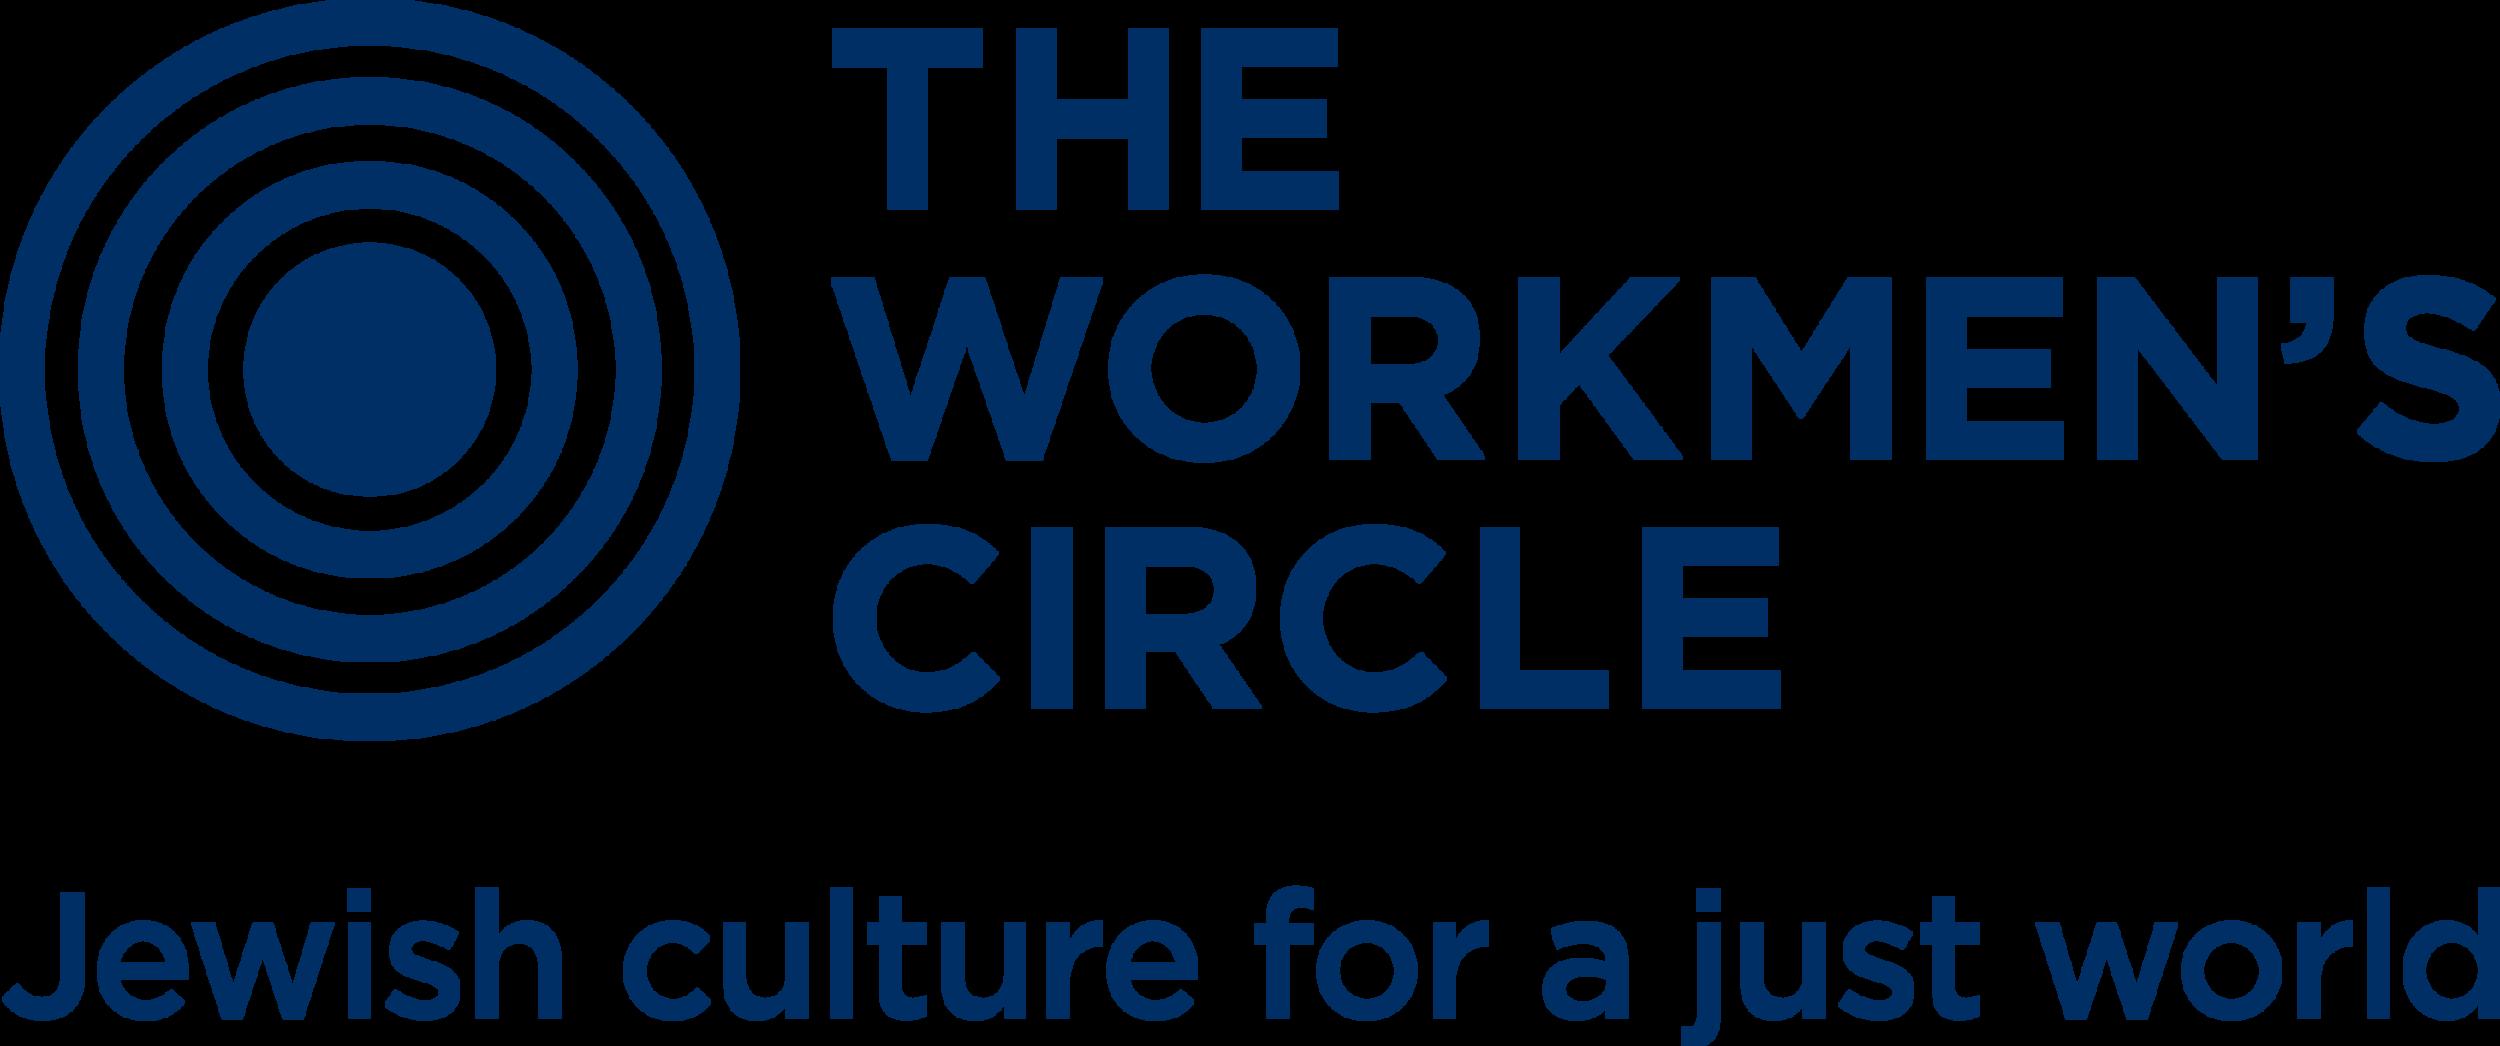 FINAL Logo and tagline Transparent.png